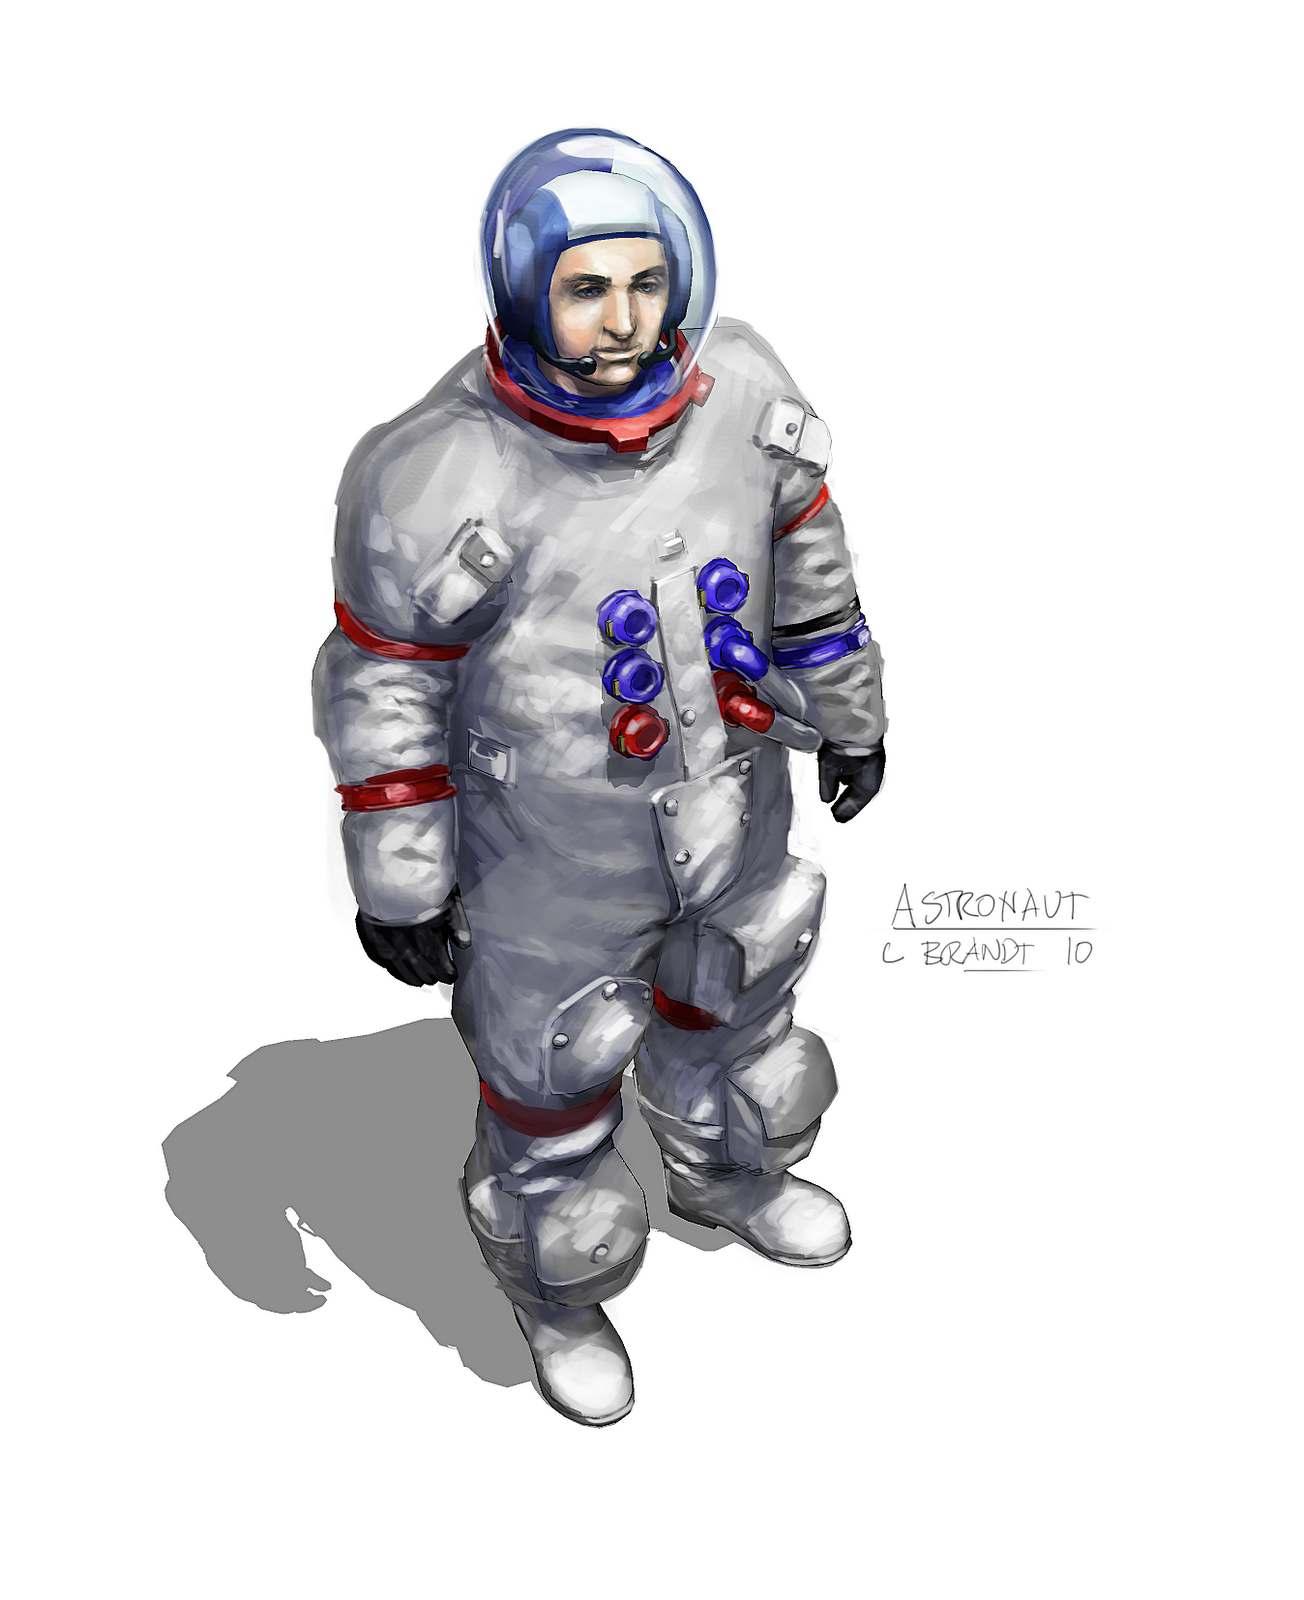 apollo 13 space suit - photo #41